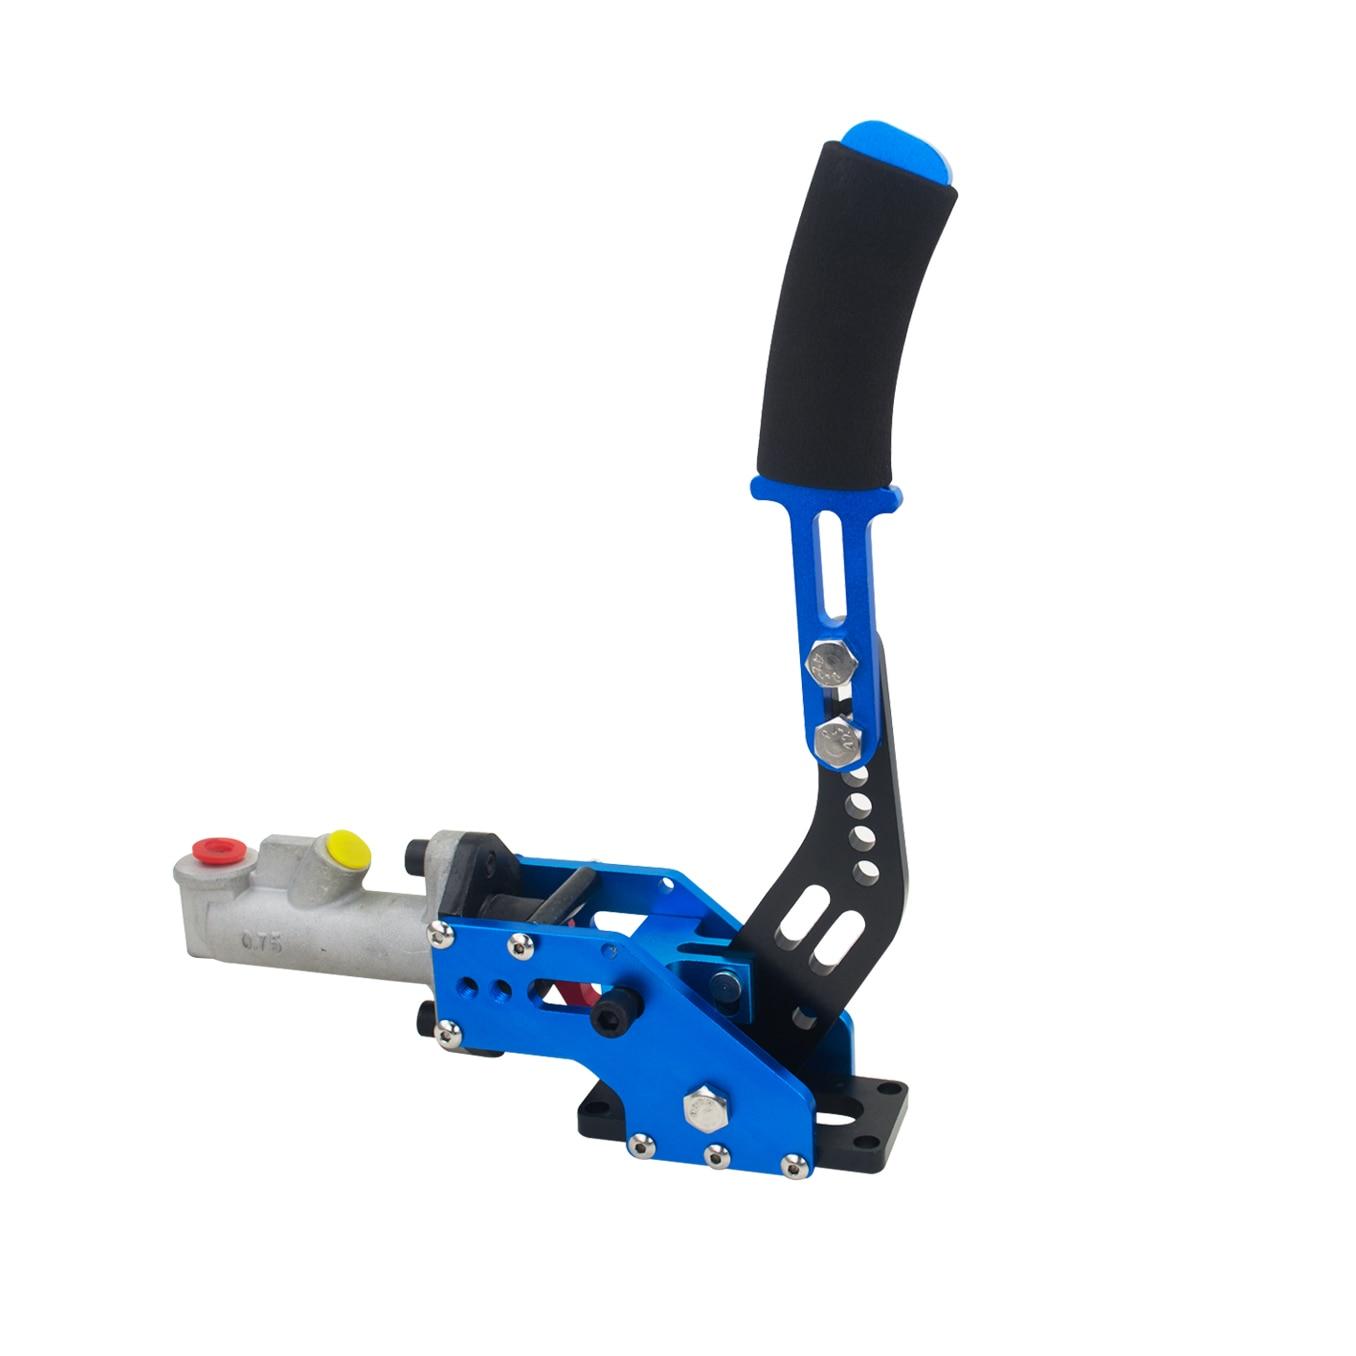 LZONE RACING - Aluminum Universal Hydraulic Handbrake Lever Drift Hand brake E-Brake Racing NEW JR3654